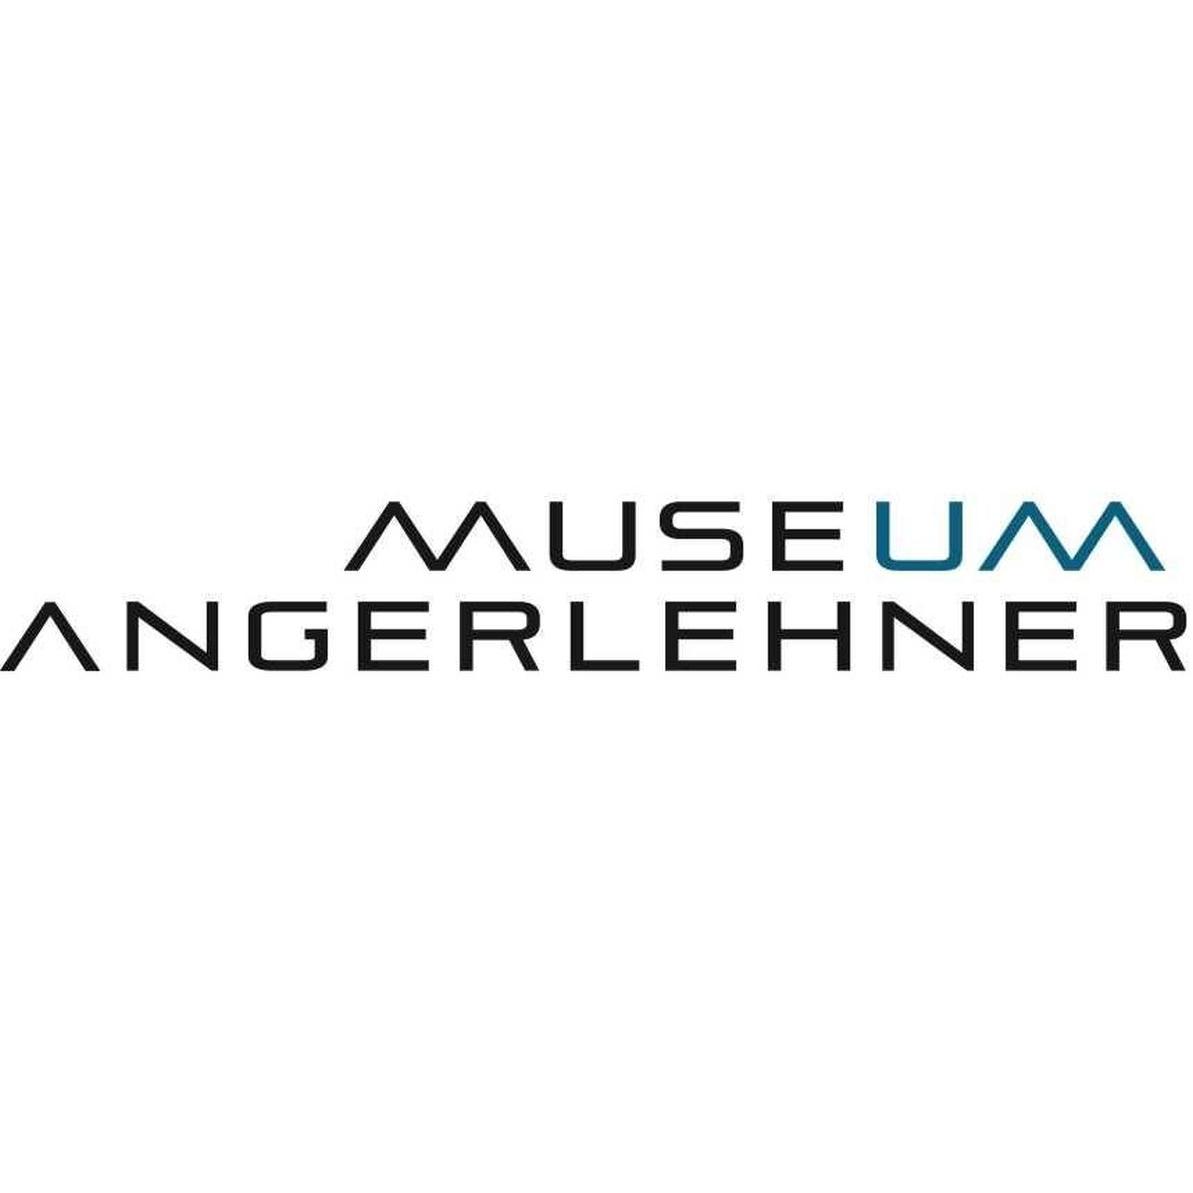 Angerlehner Museums GmbH